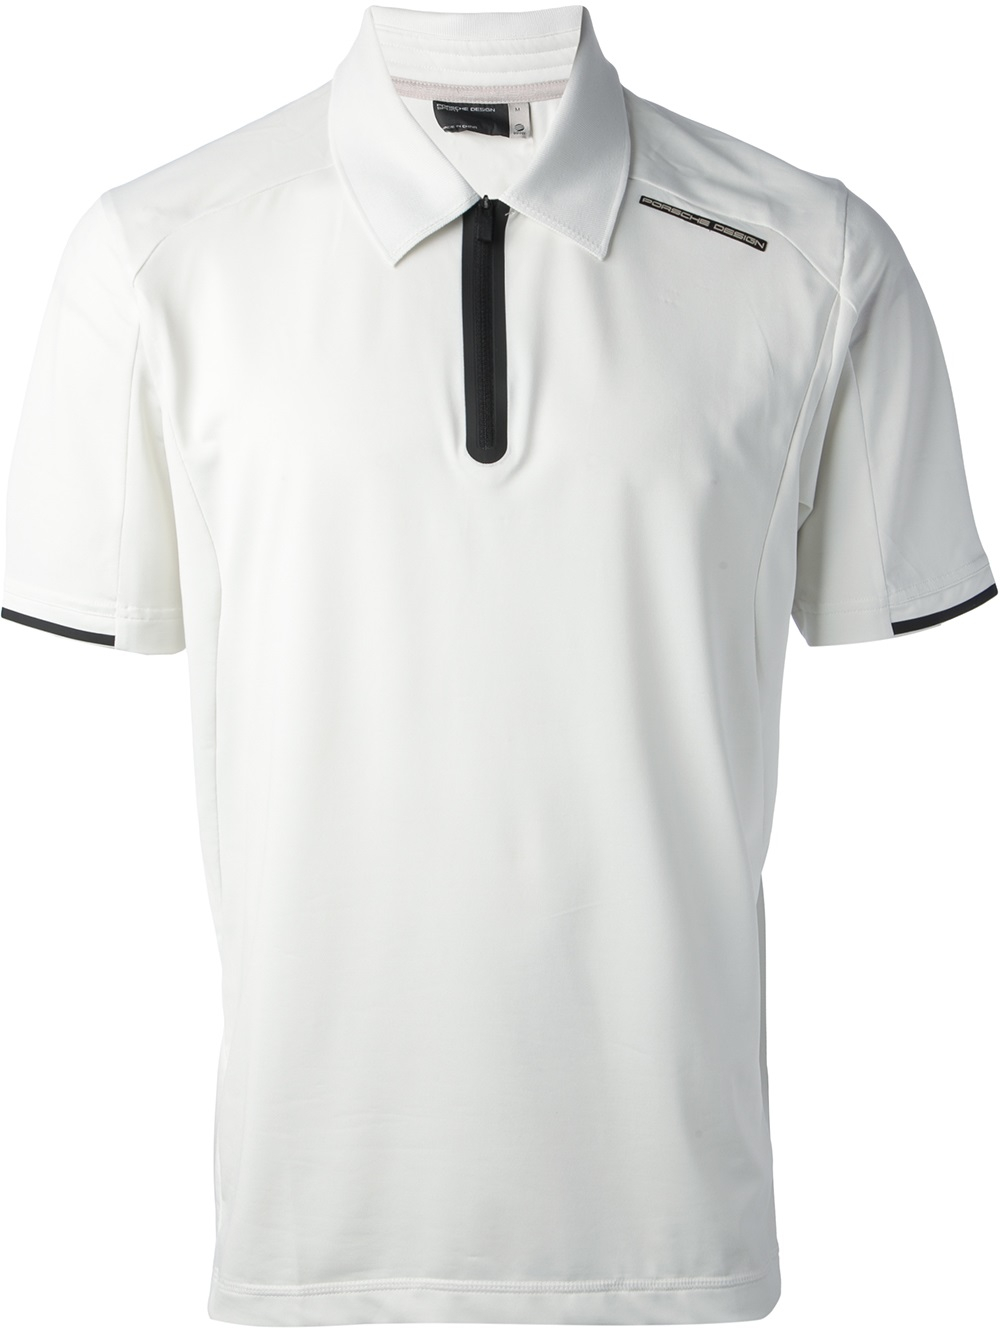 ebe91e4ef Porsche Design Branded Jersey Polo Shirt in White for Men - Lyst